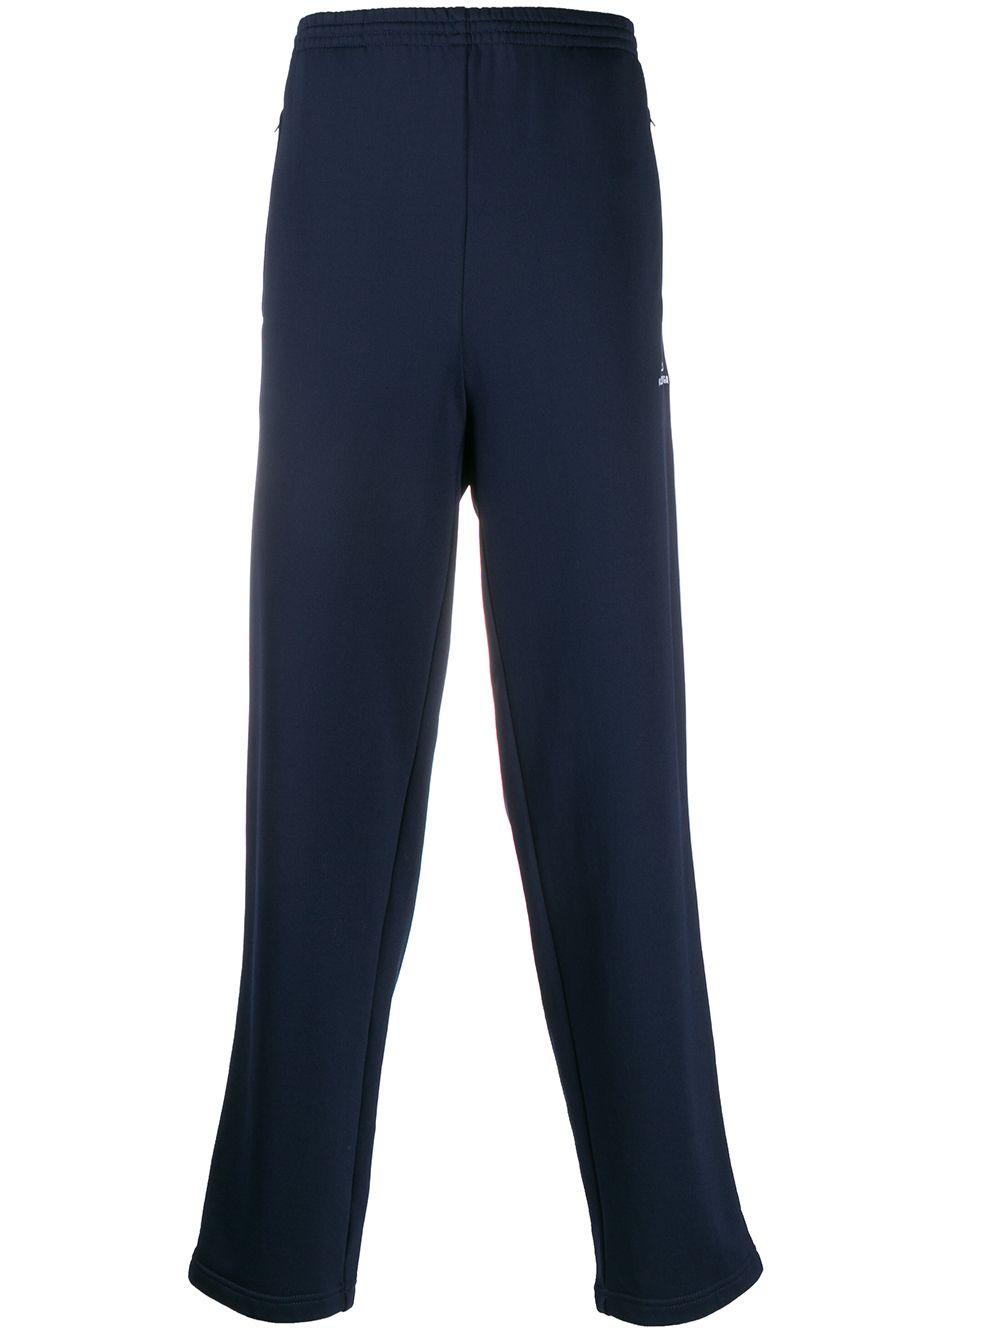 Navy blue cotton blend side stripe track trousers   BALENCIAGA |  | 595007-TGV048502